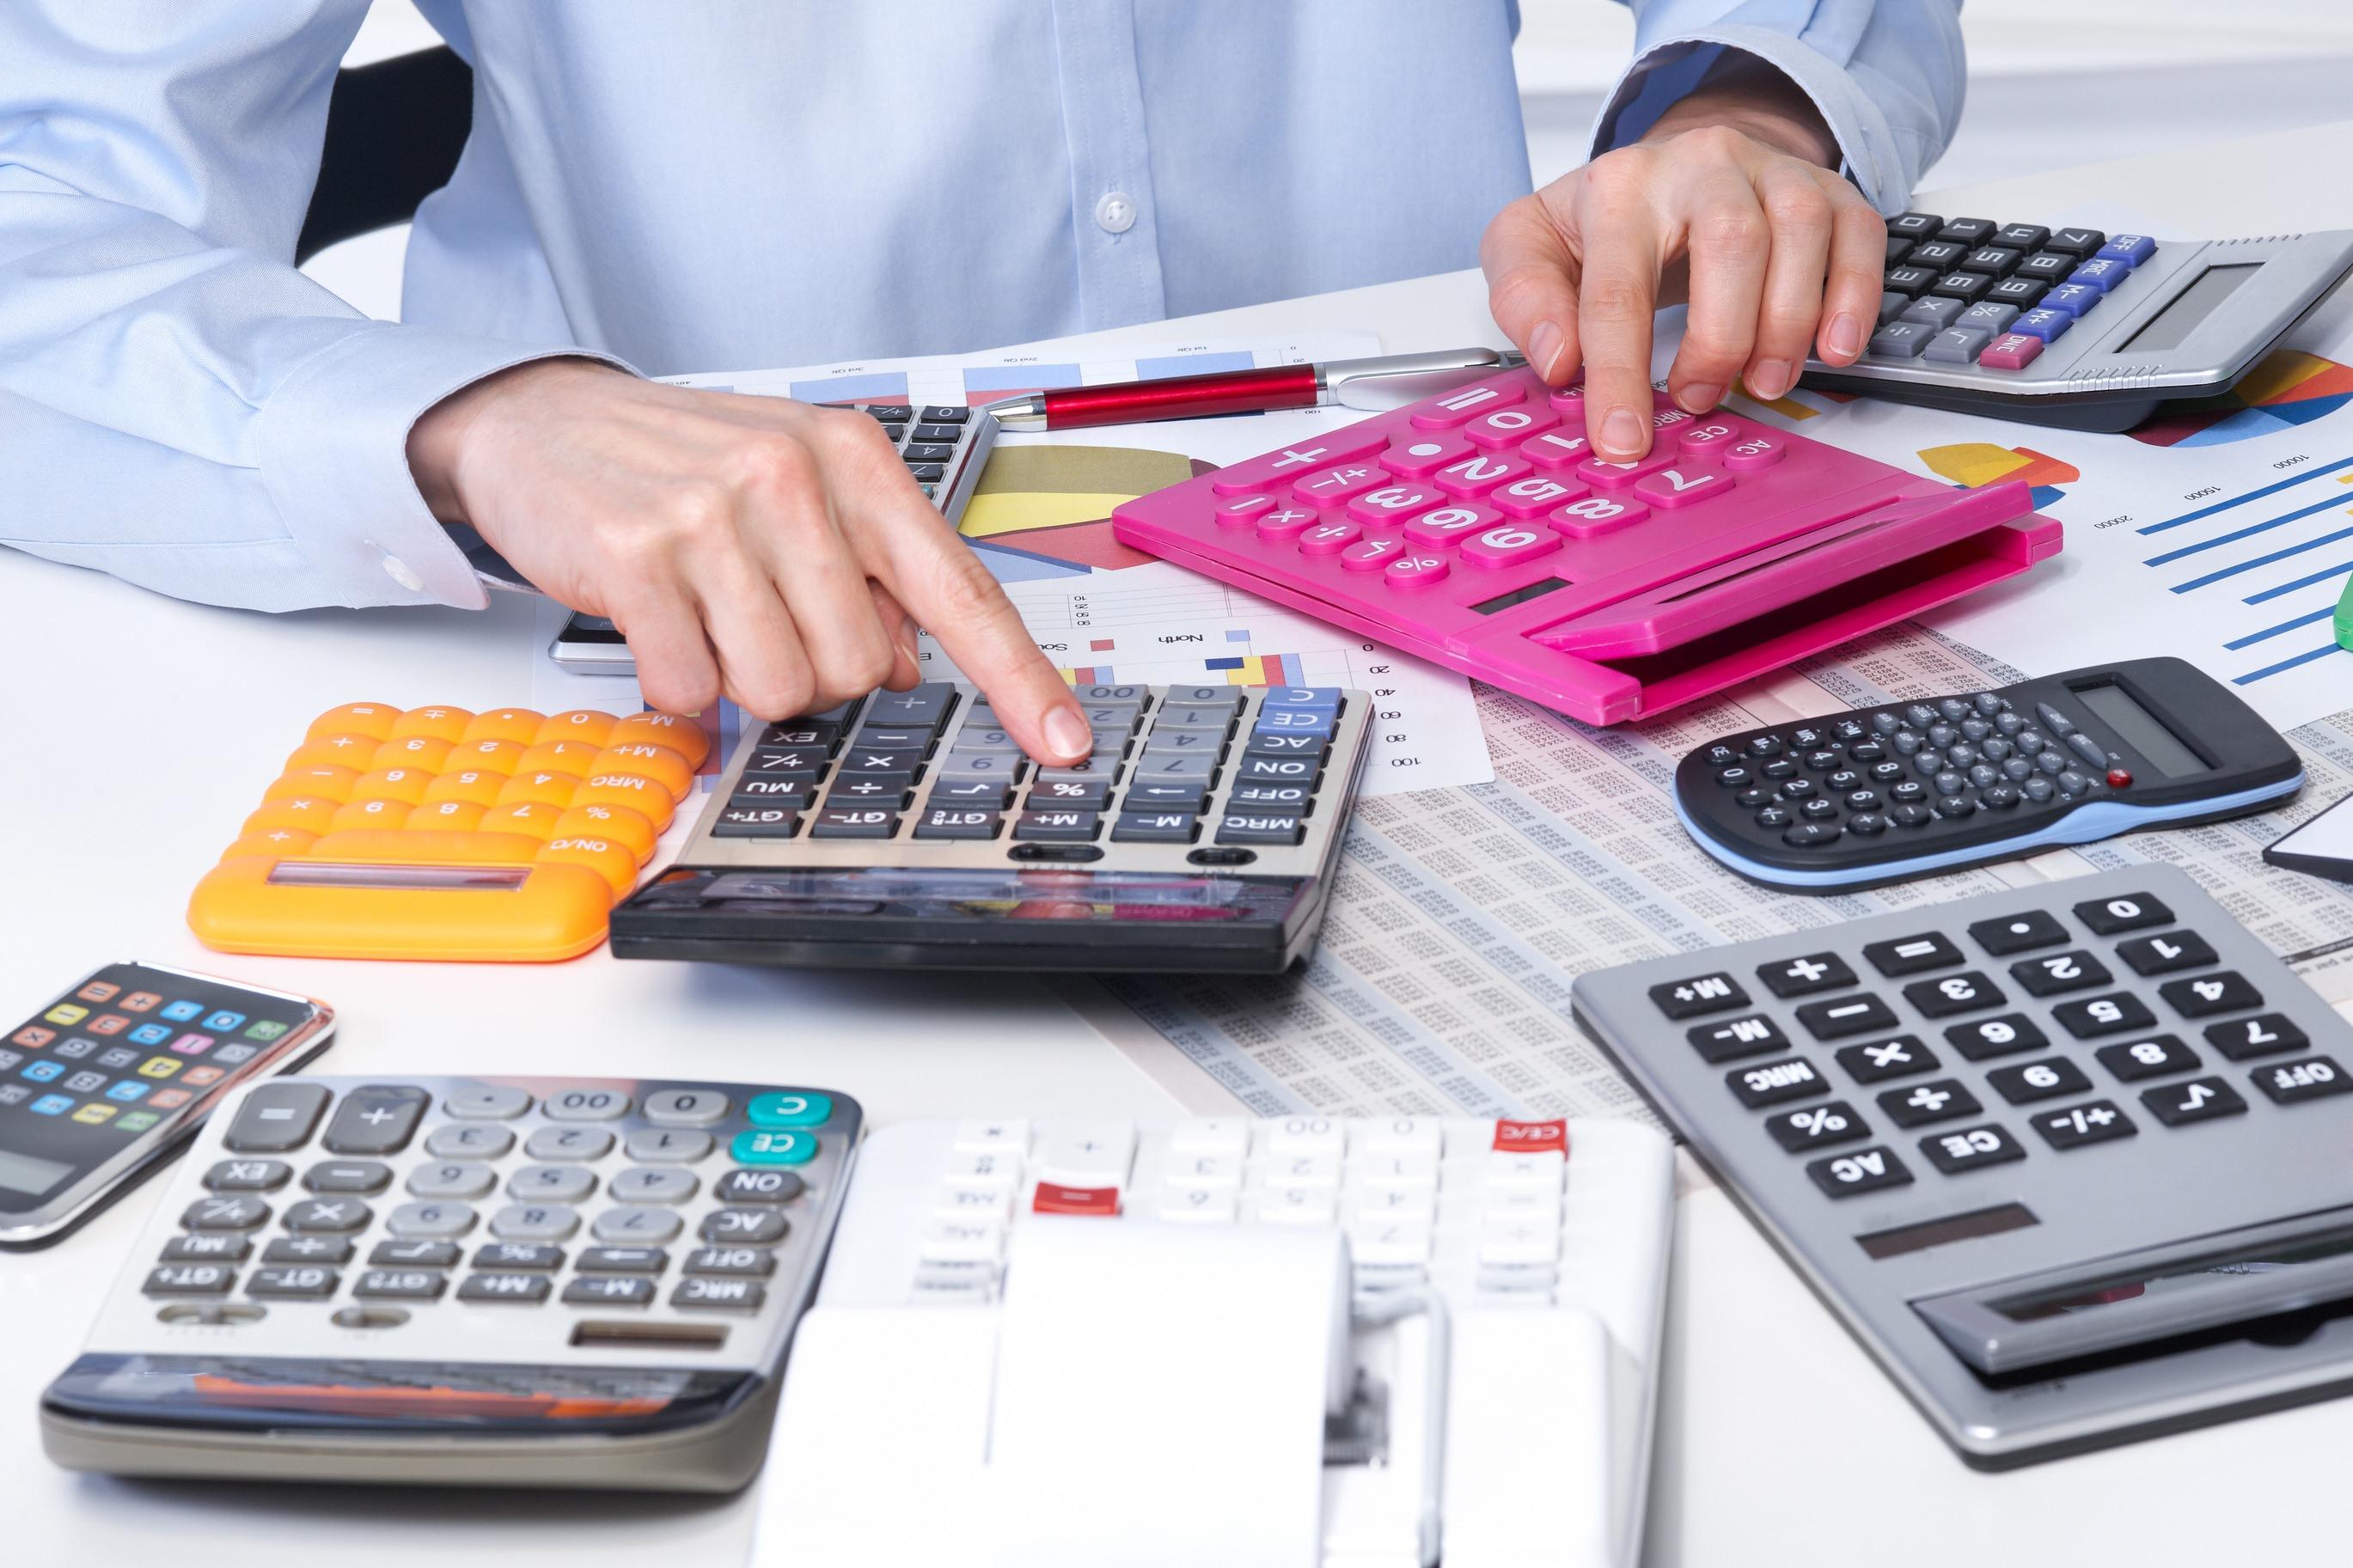 mortgageintellectual com helping you get in mortgage calculators